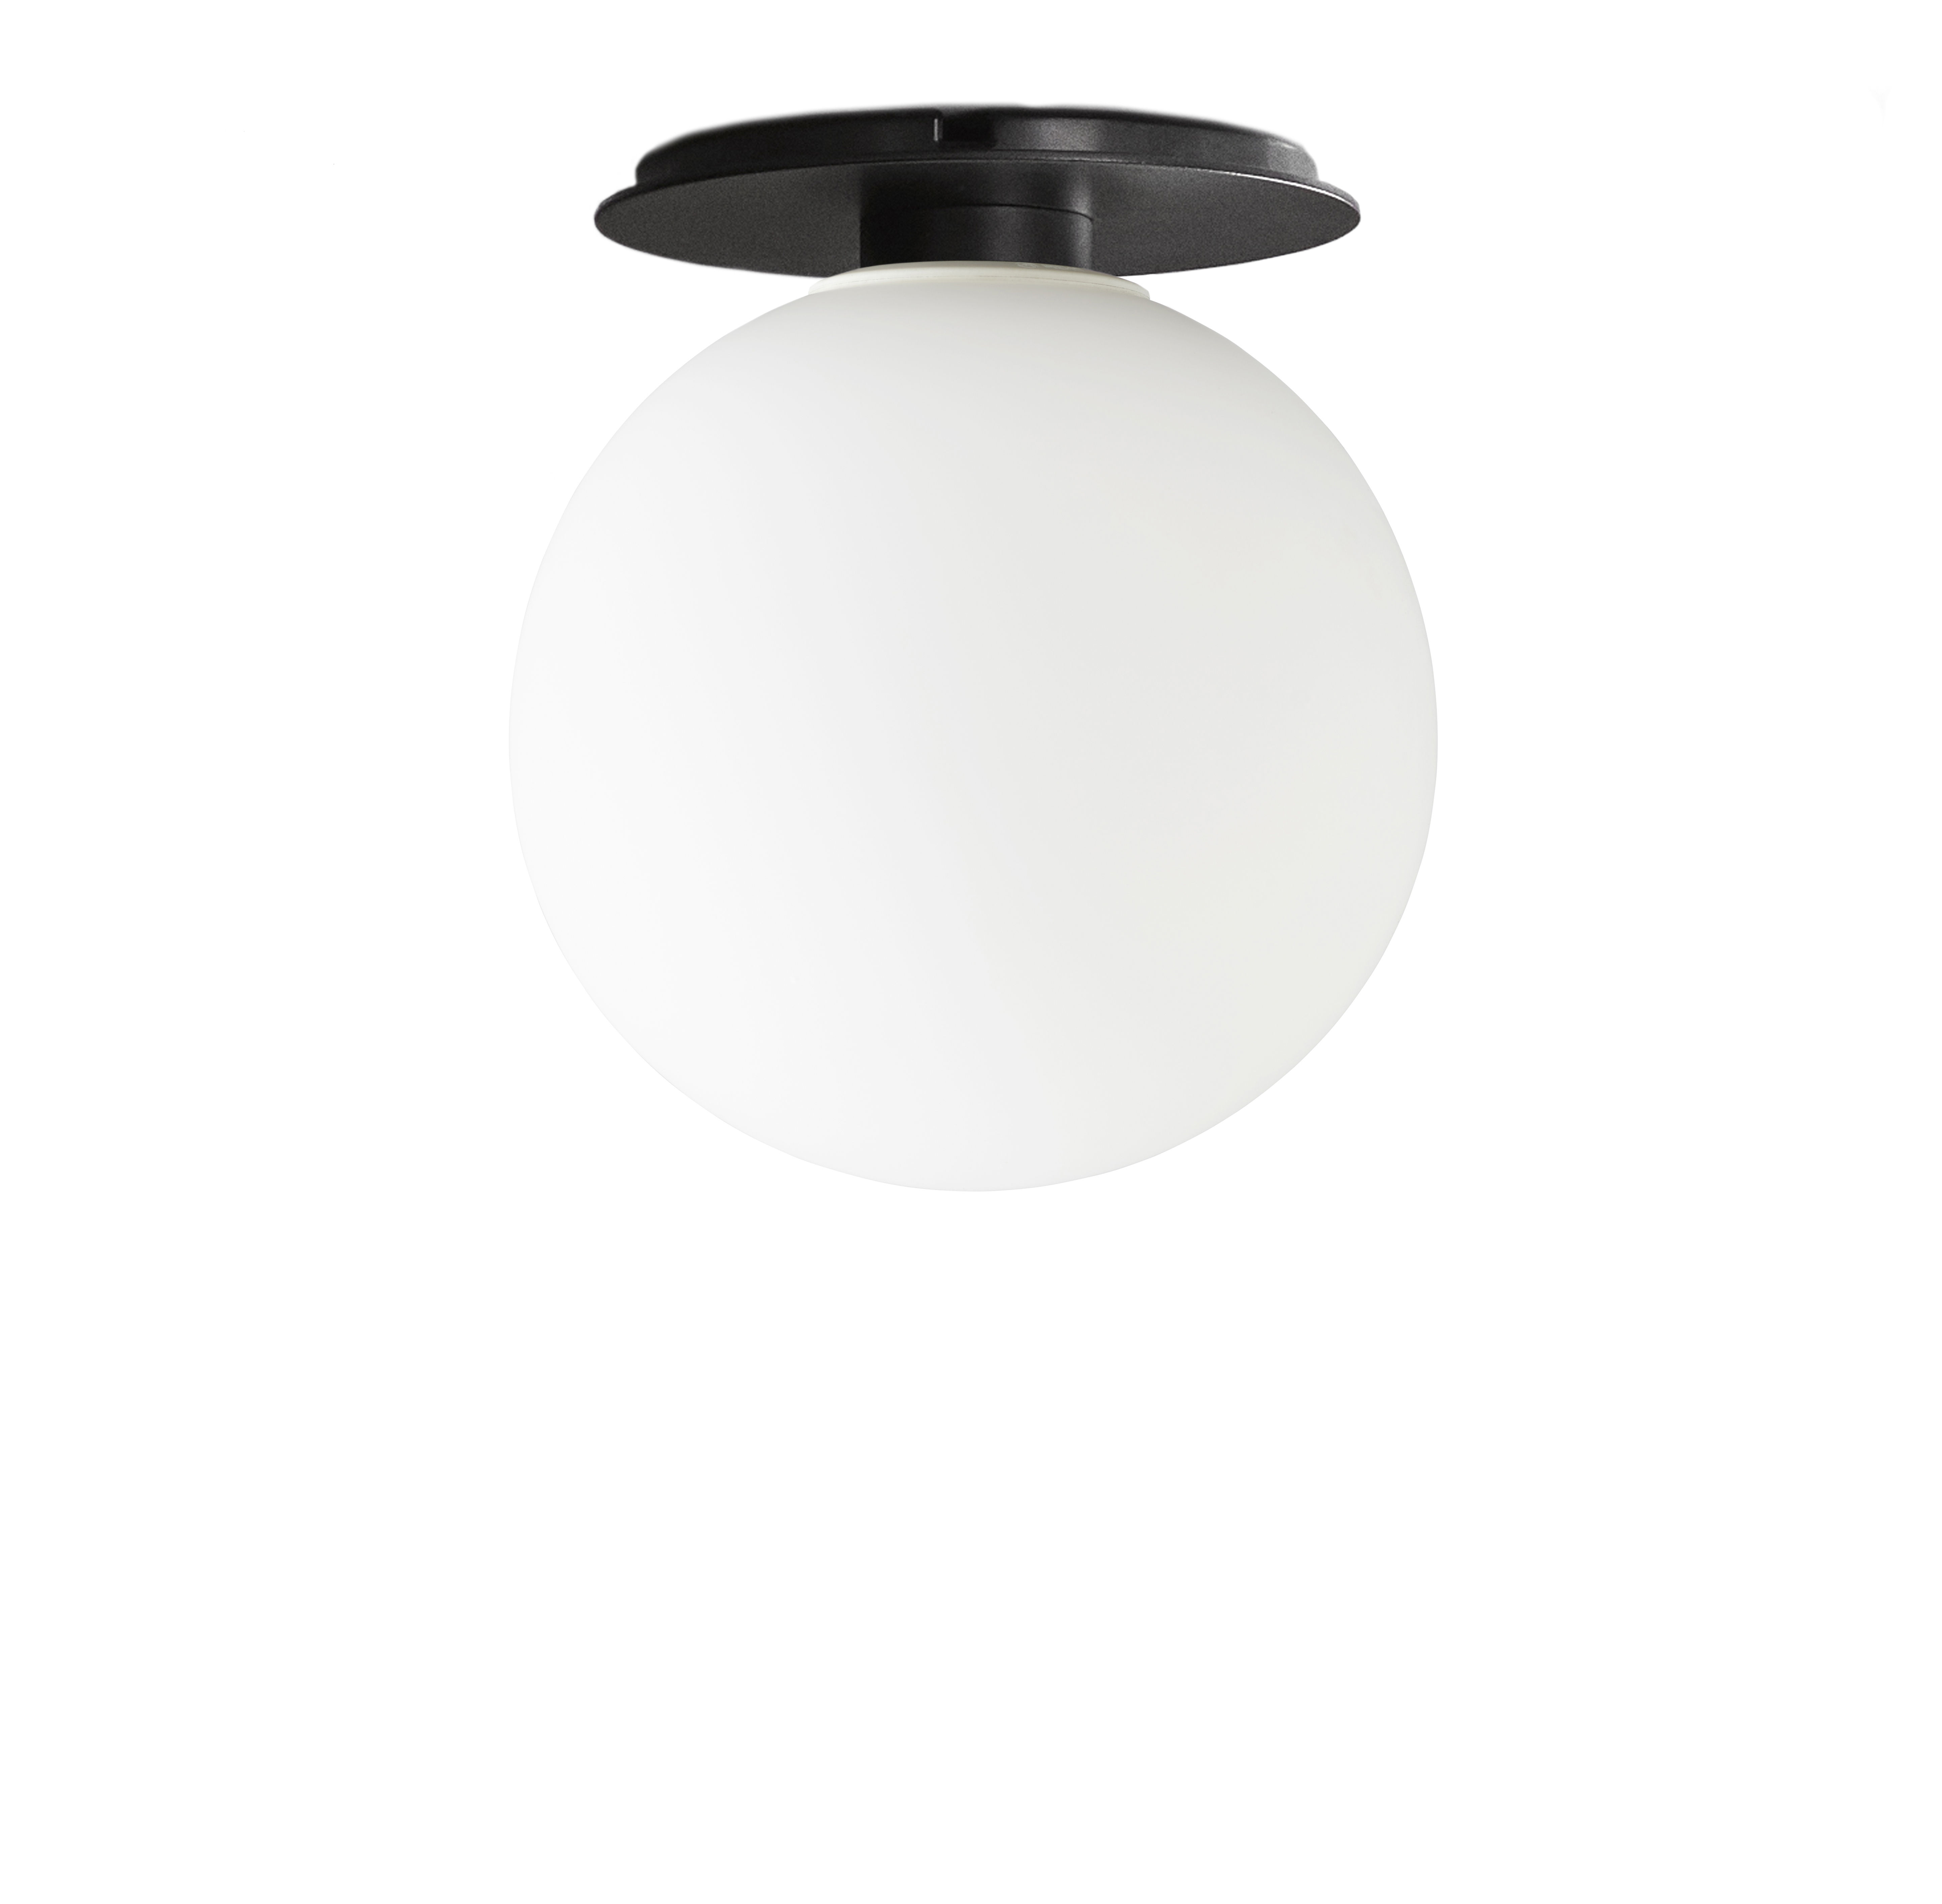 Lighting - Wall Lights - TR Bulb Wall light - / Wall lamp - Metal & glass by Menu - White & Black - Lacquered steel, Opal Glass